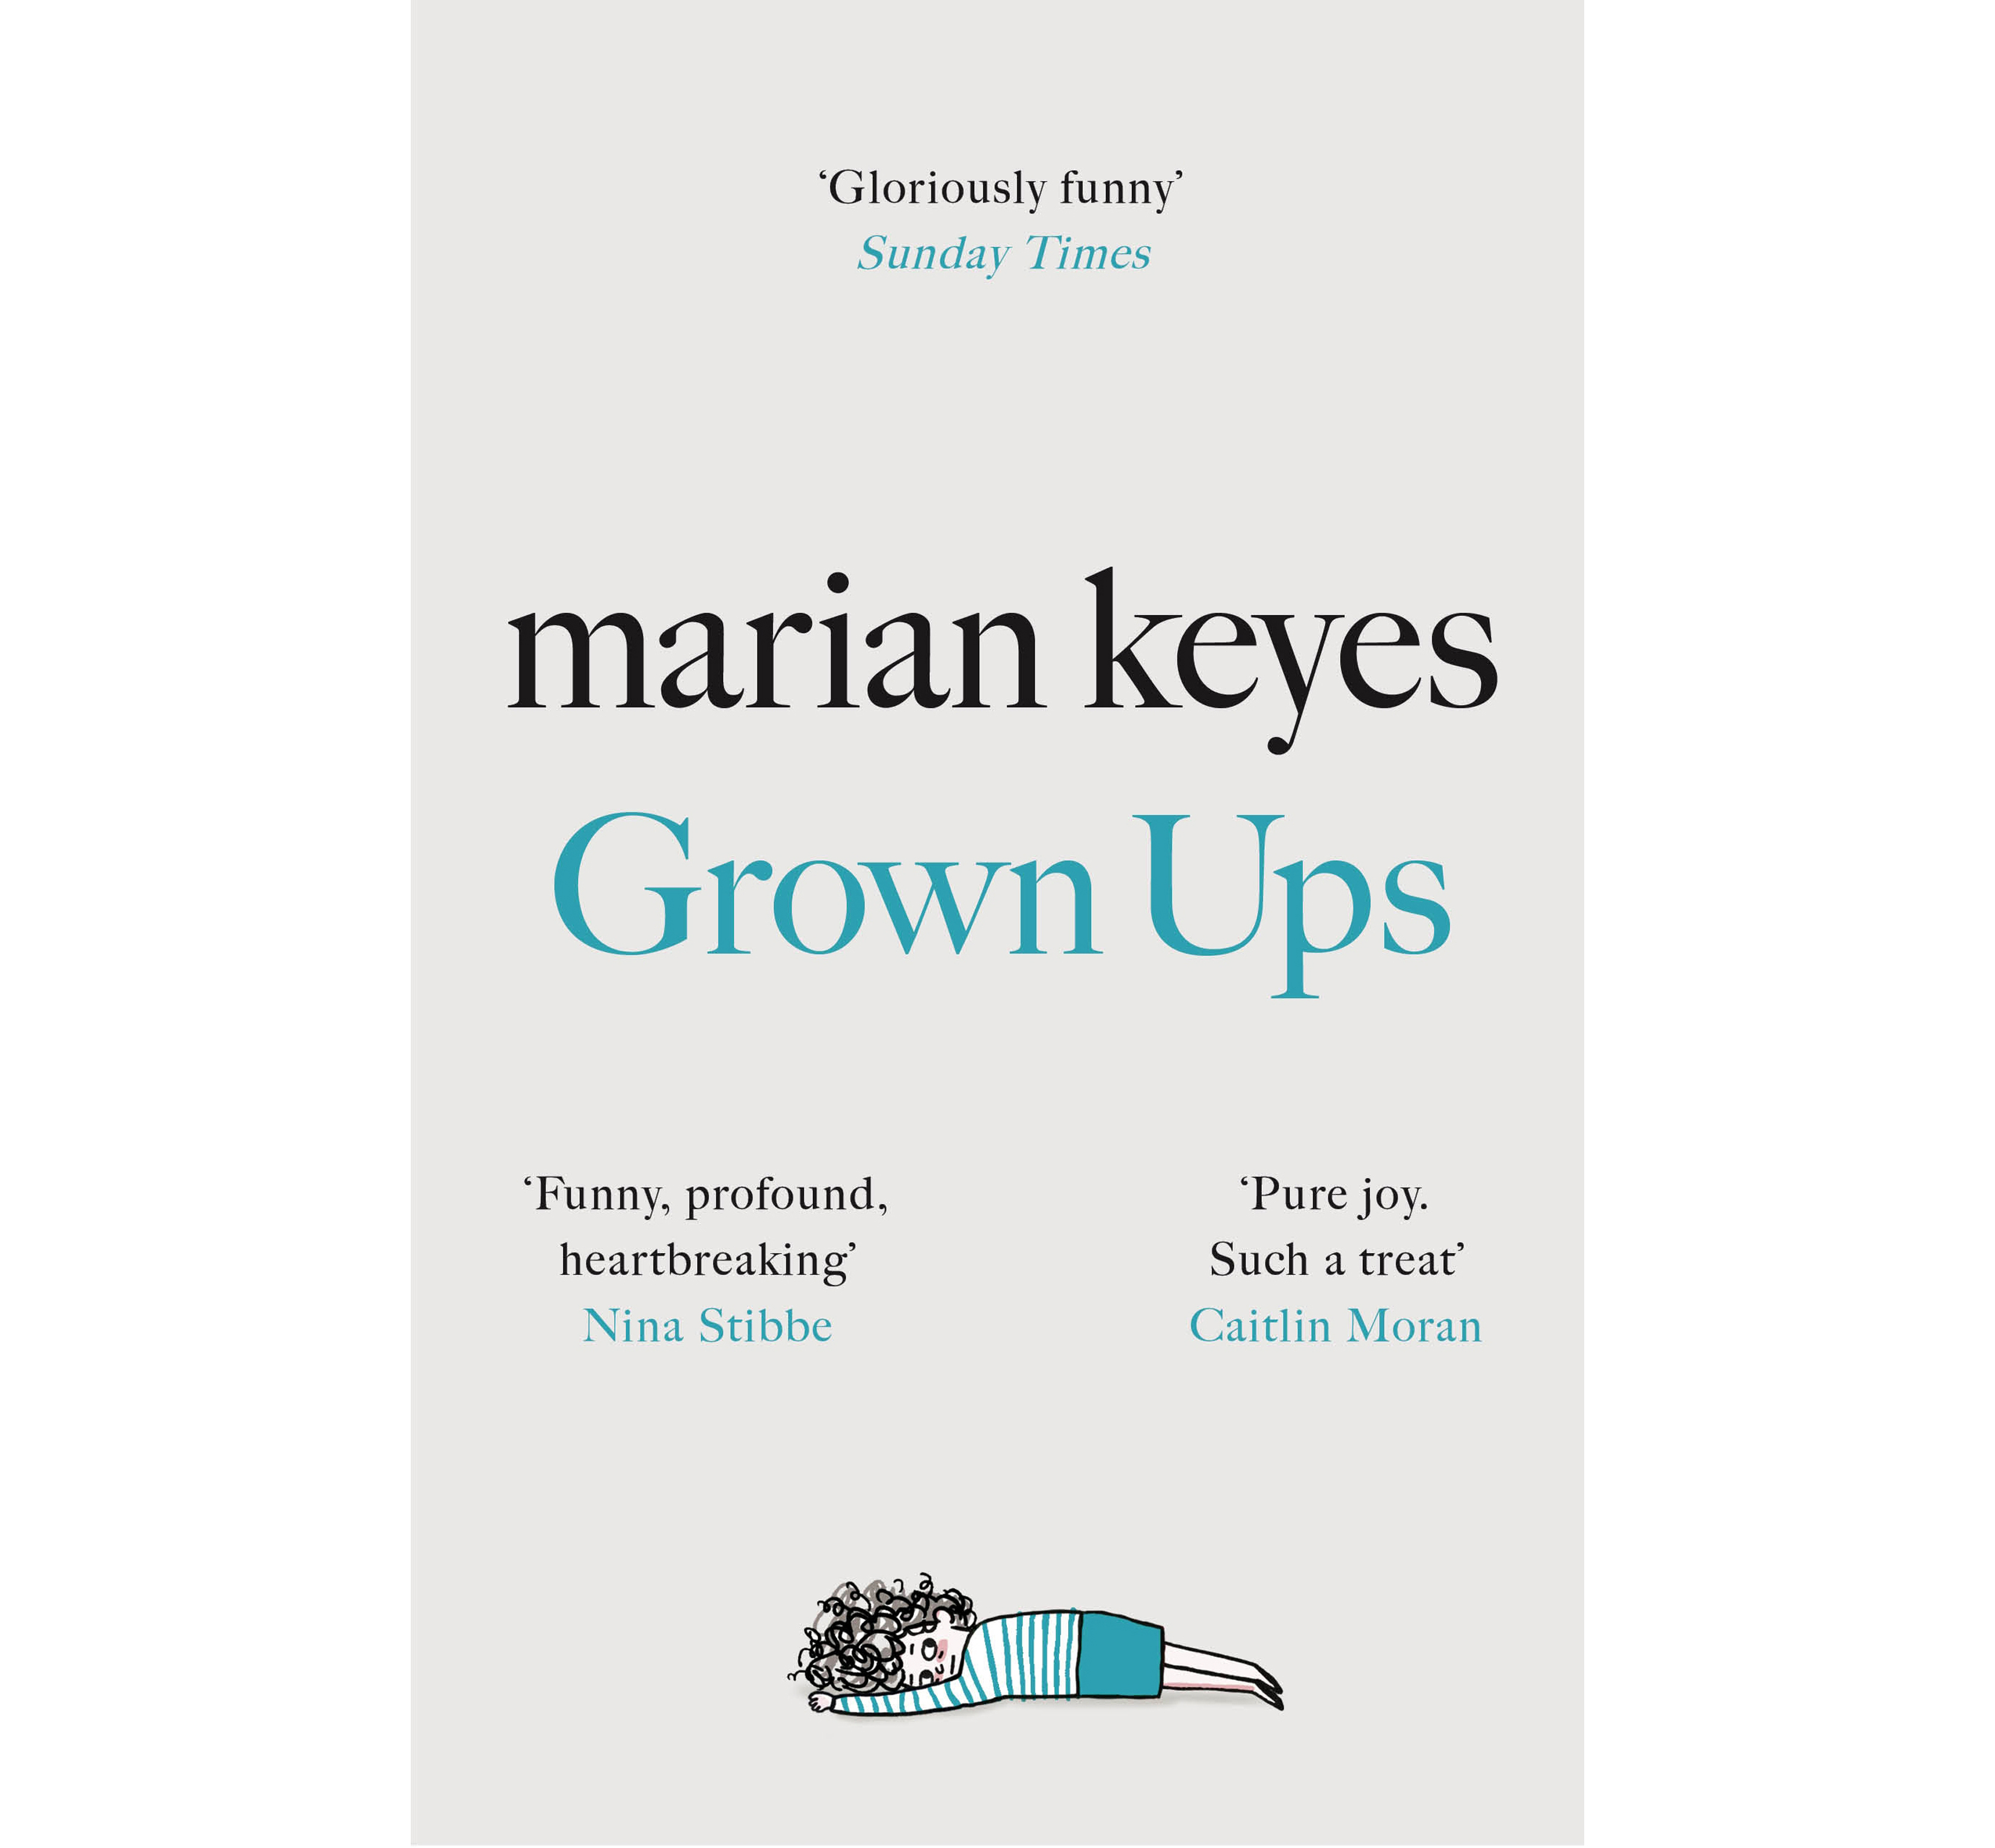 Grown Ups by Marian Keyes (Michael Joseph/PA)